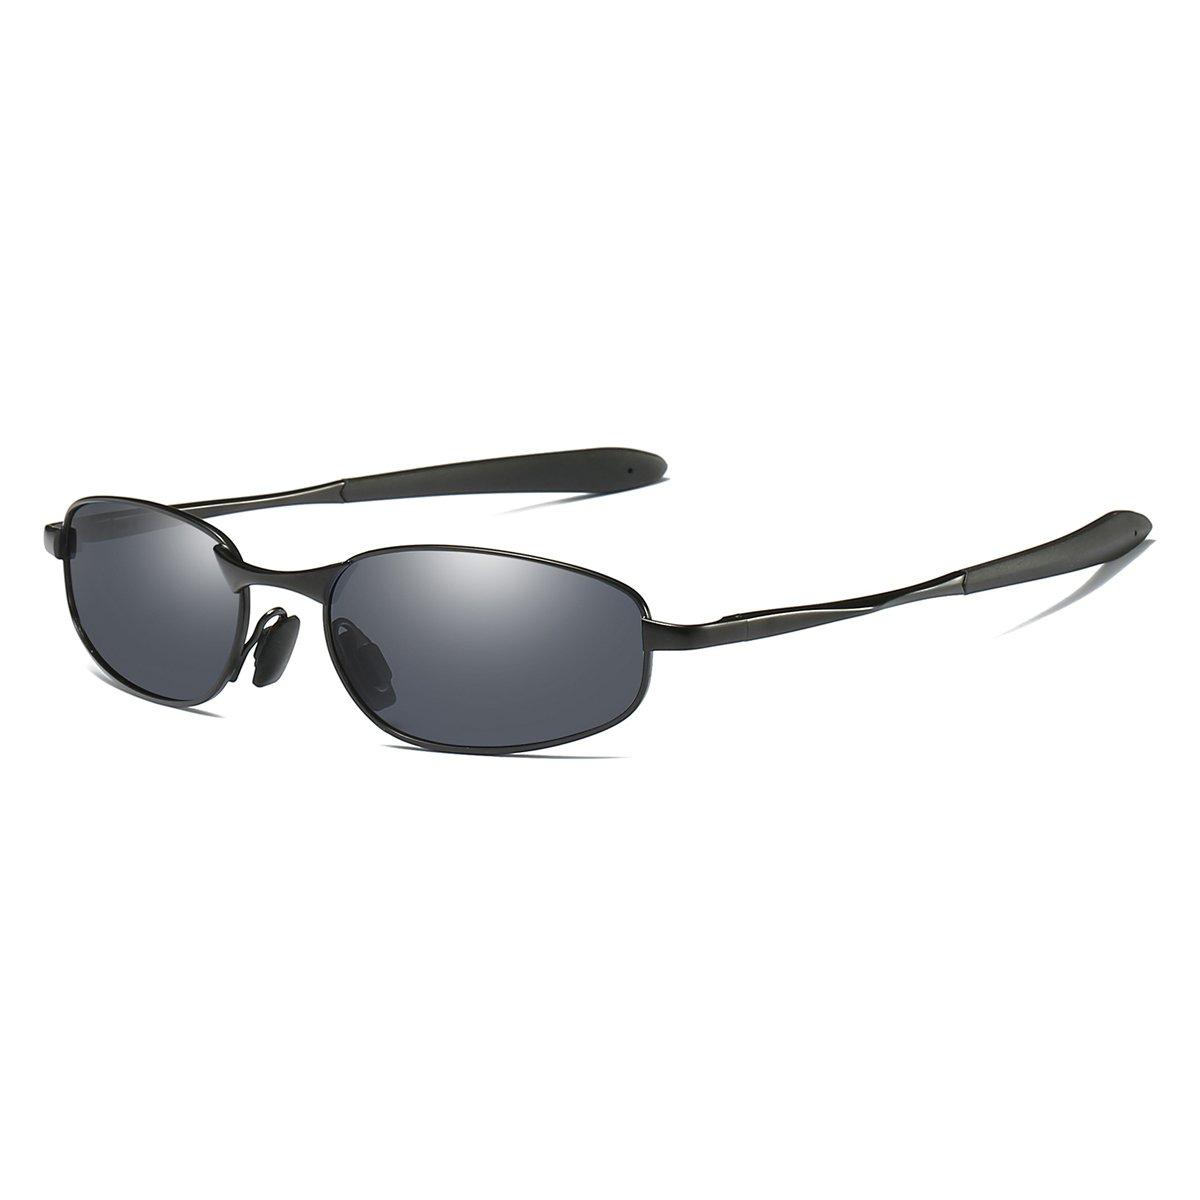 Polarized Sunglasses Small Size Rectangular Wrap Metal Frame UV400 Protection (Black, 53)